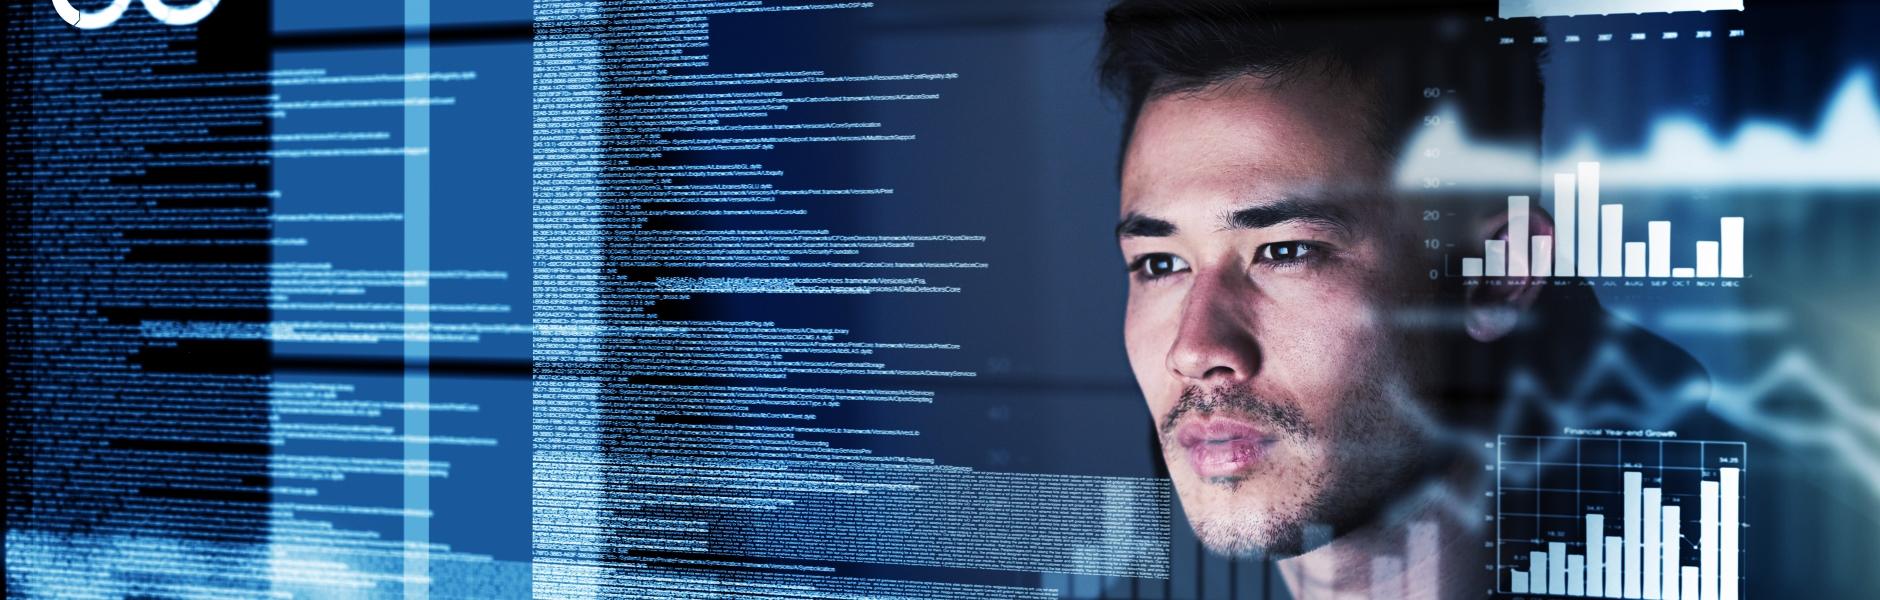 hacking-computer-focused-programming